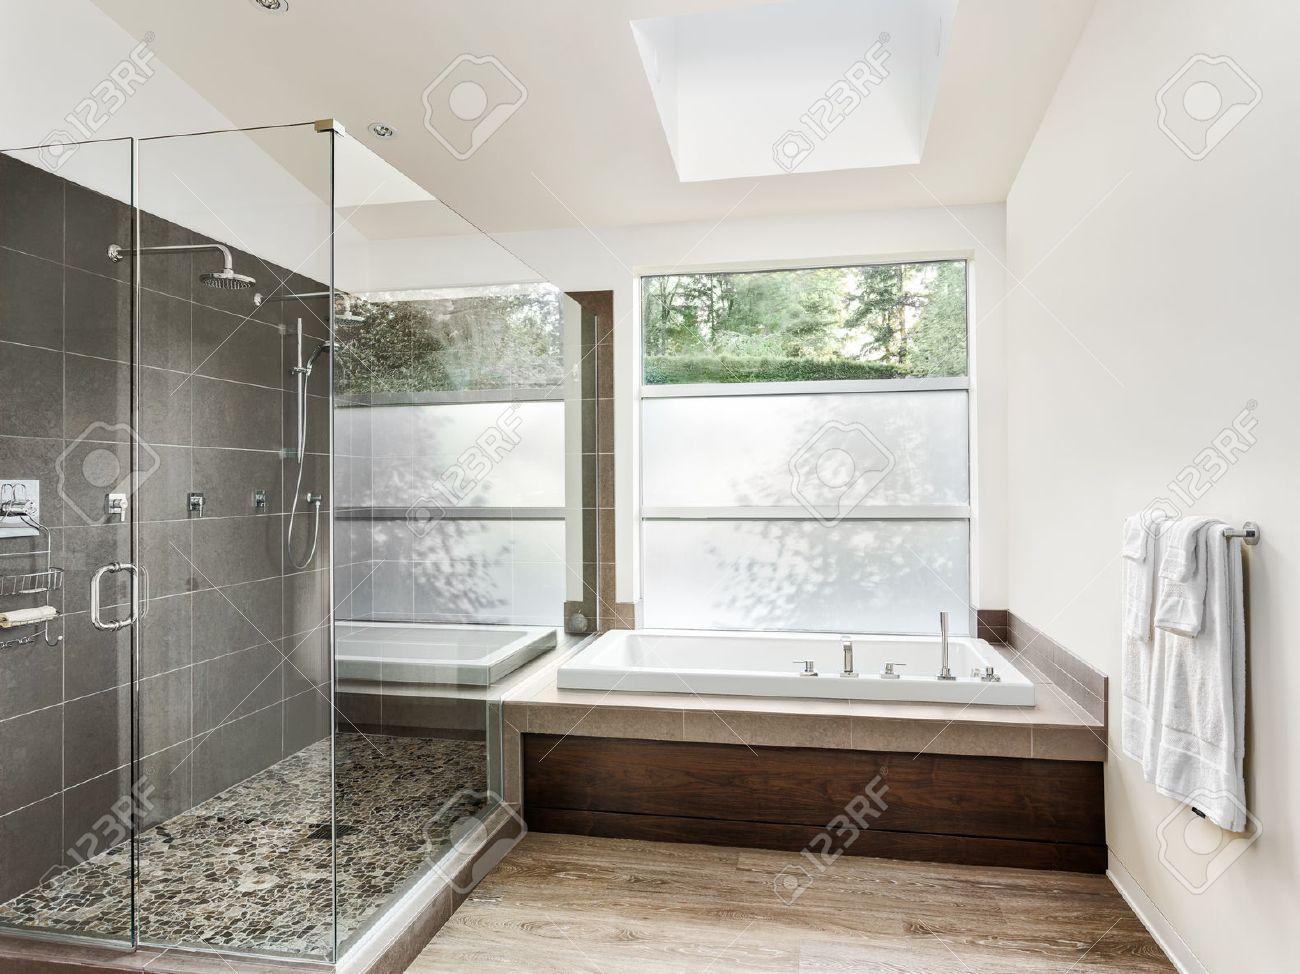 Bathroom interior in new luxury home: bathtub with walk in curbless..